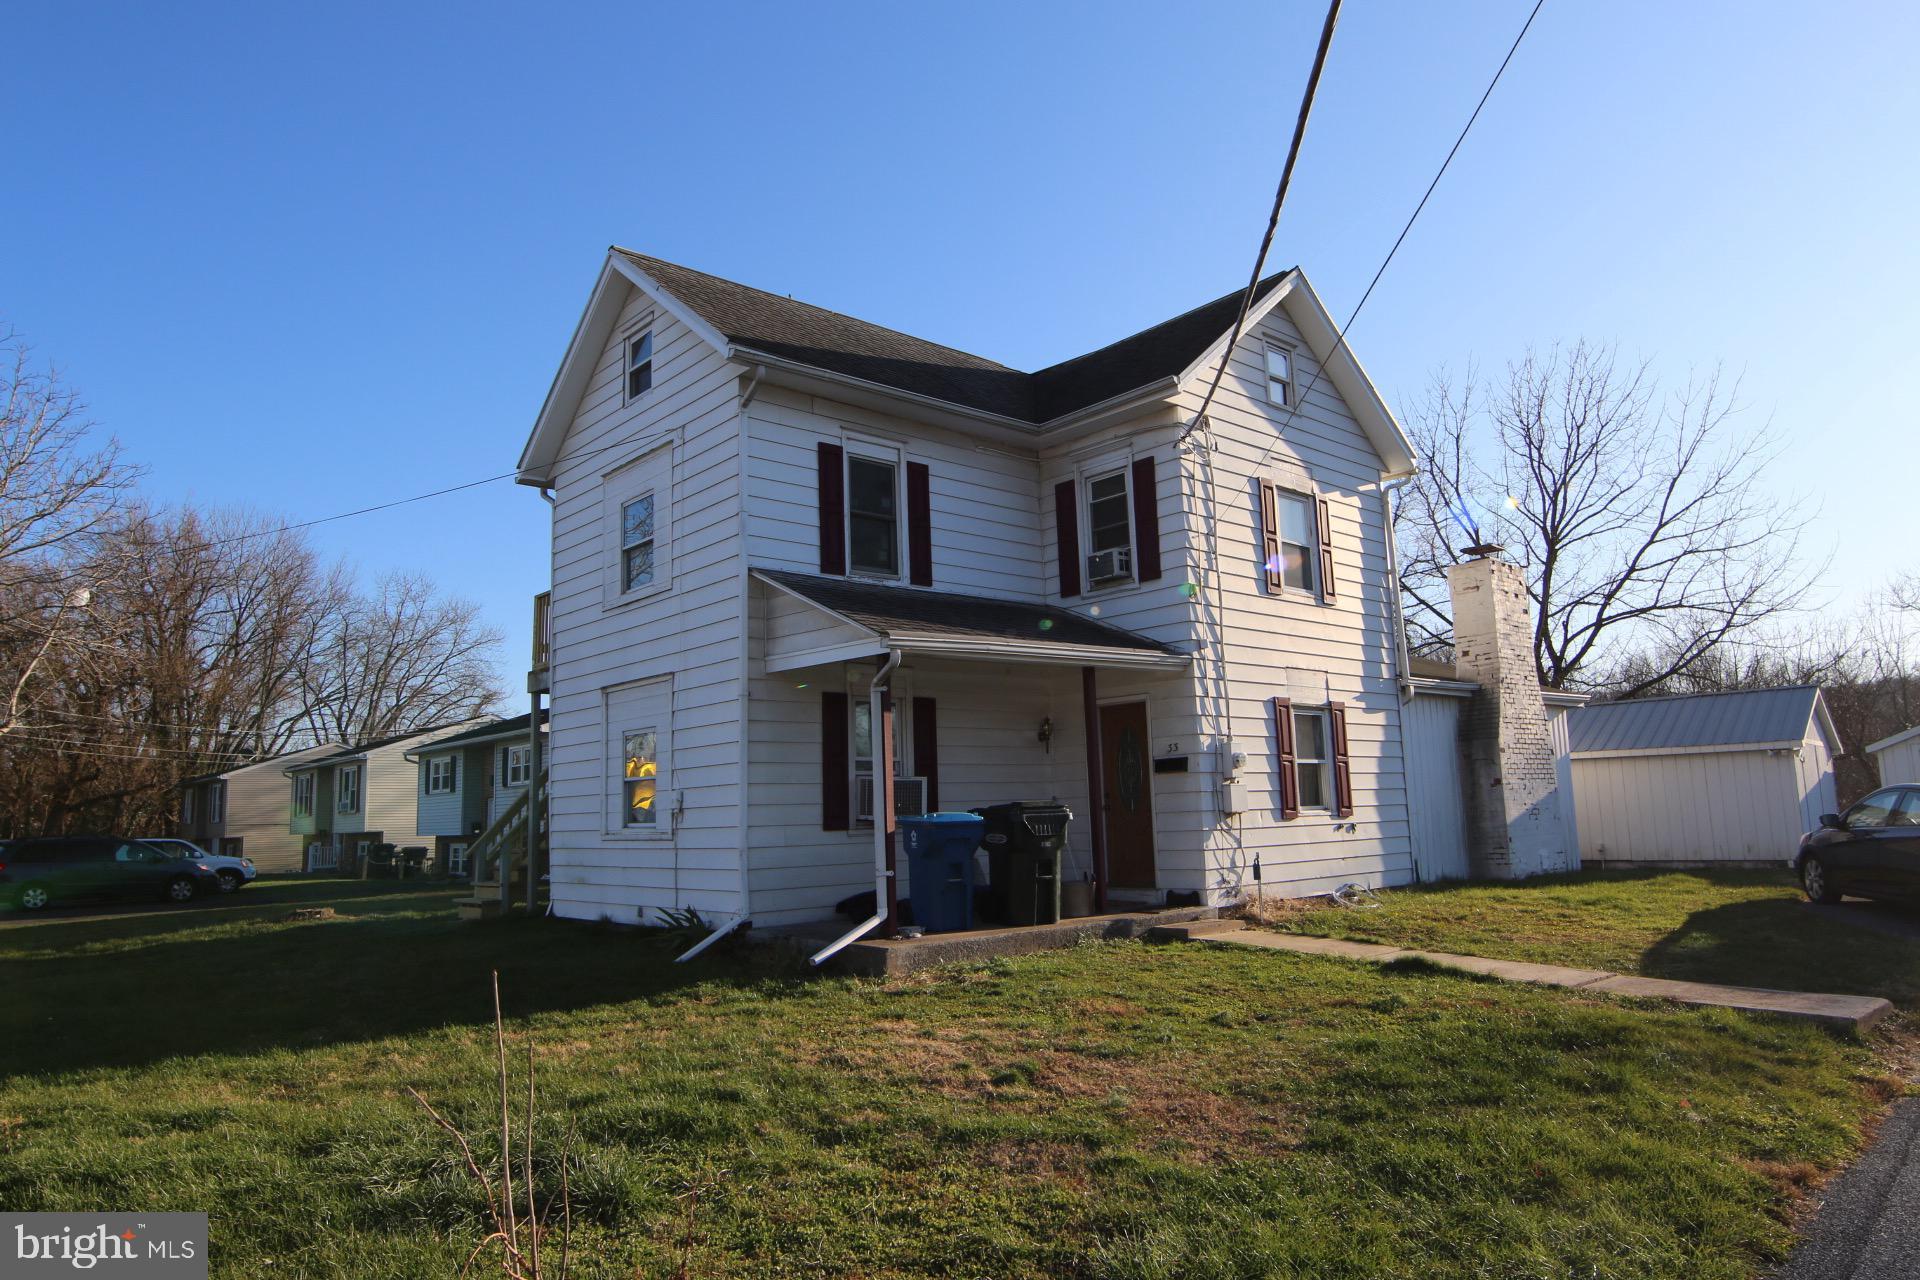 33 CHARLES STREET, HIGHSPIRE, PA 17034